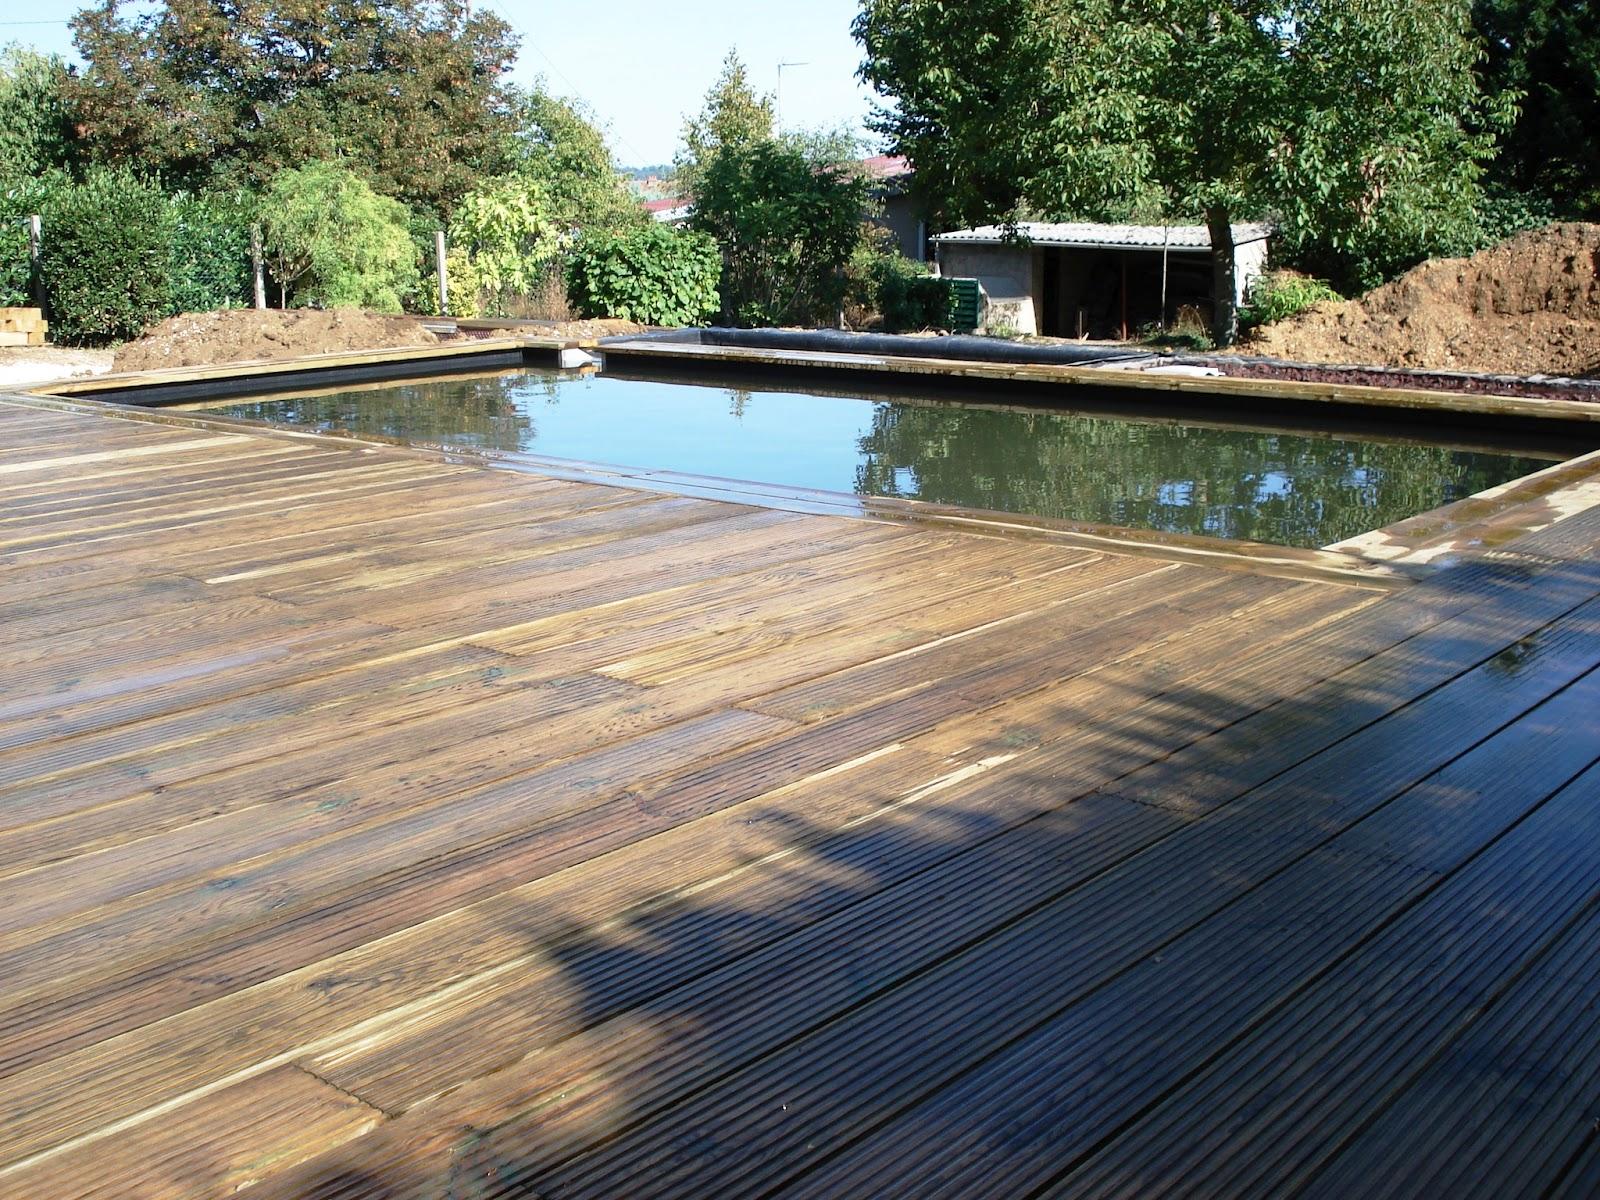 piscine naturelle et baignade naturelle. Black Bedroom Furniture Sets. Home Design Ideas